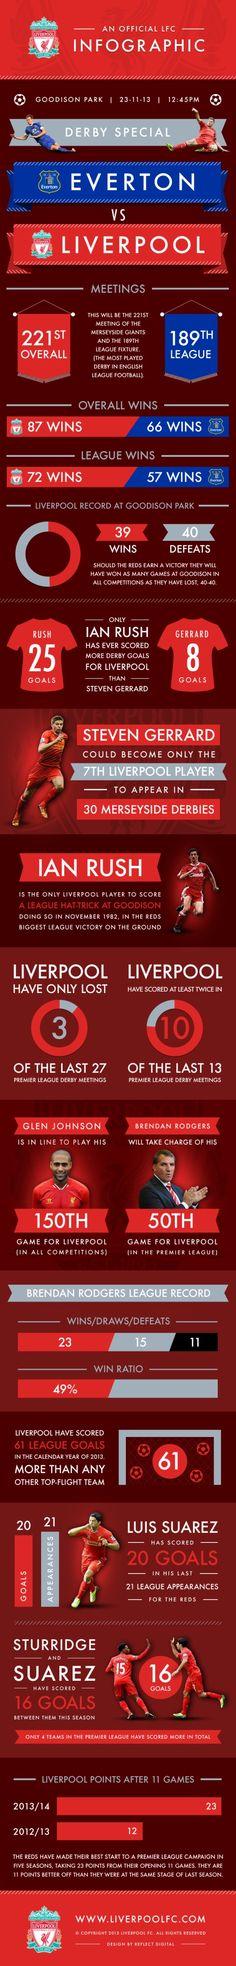 Merseyside derby infographic: Everton v Liverpool - Liverpool FC